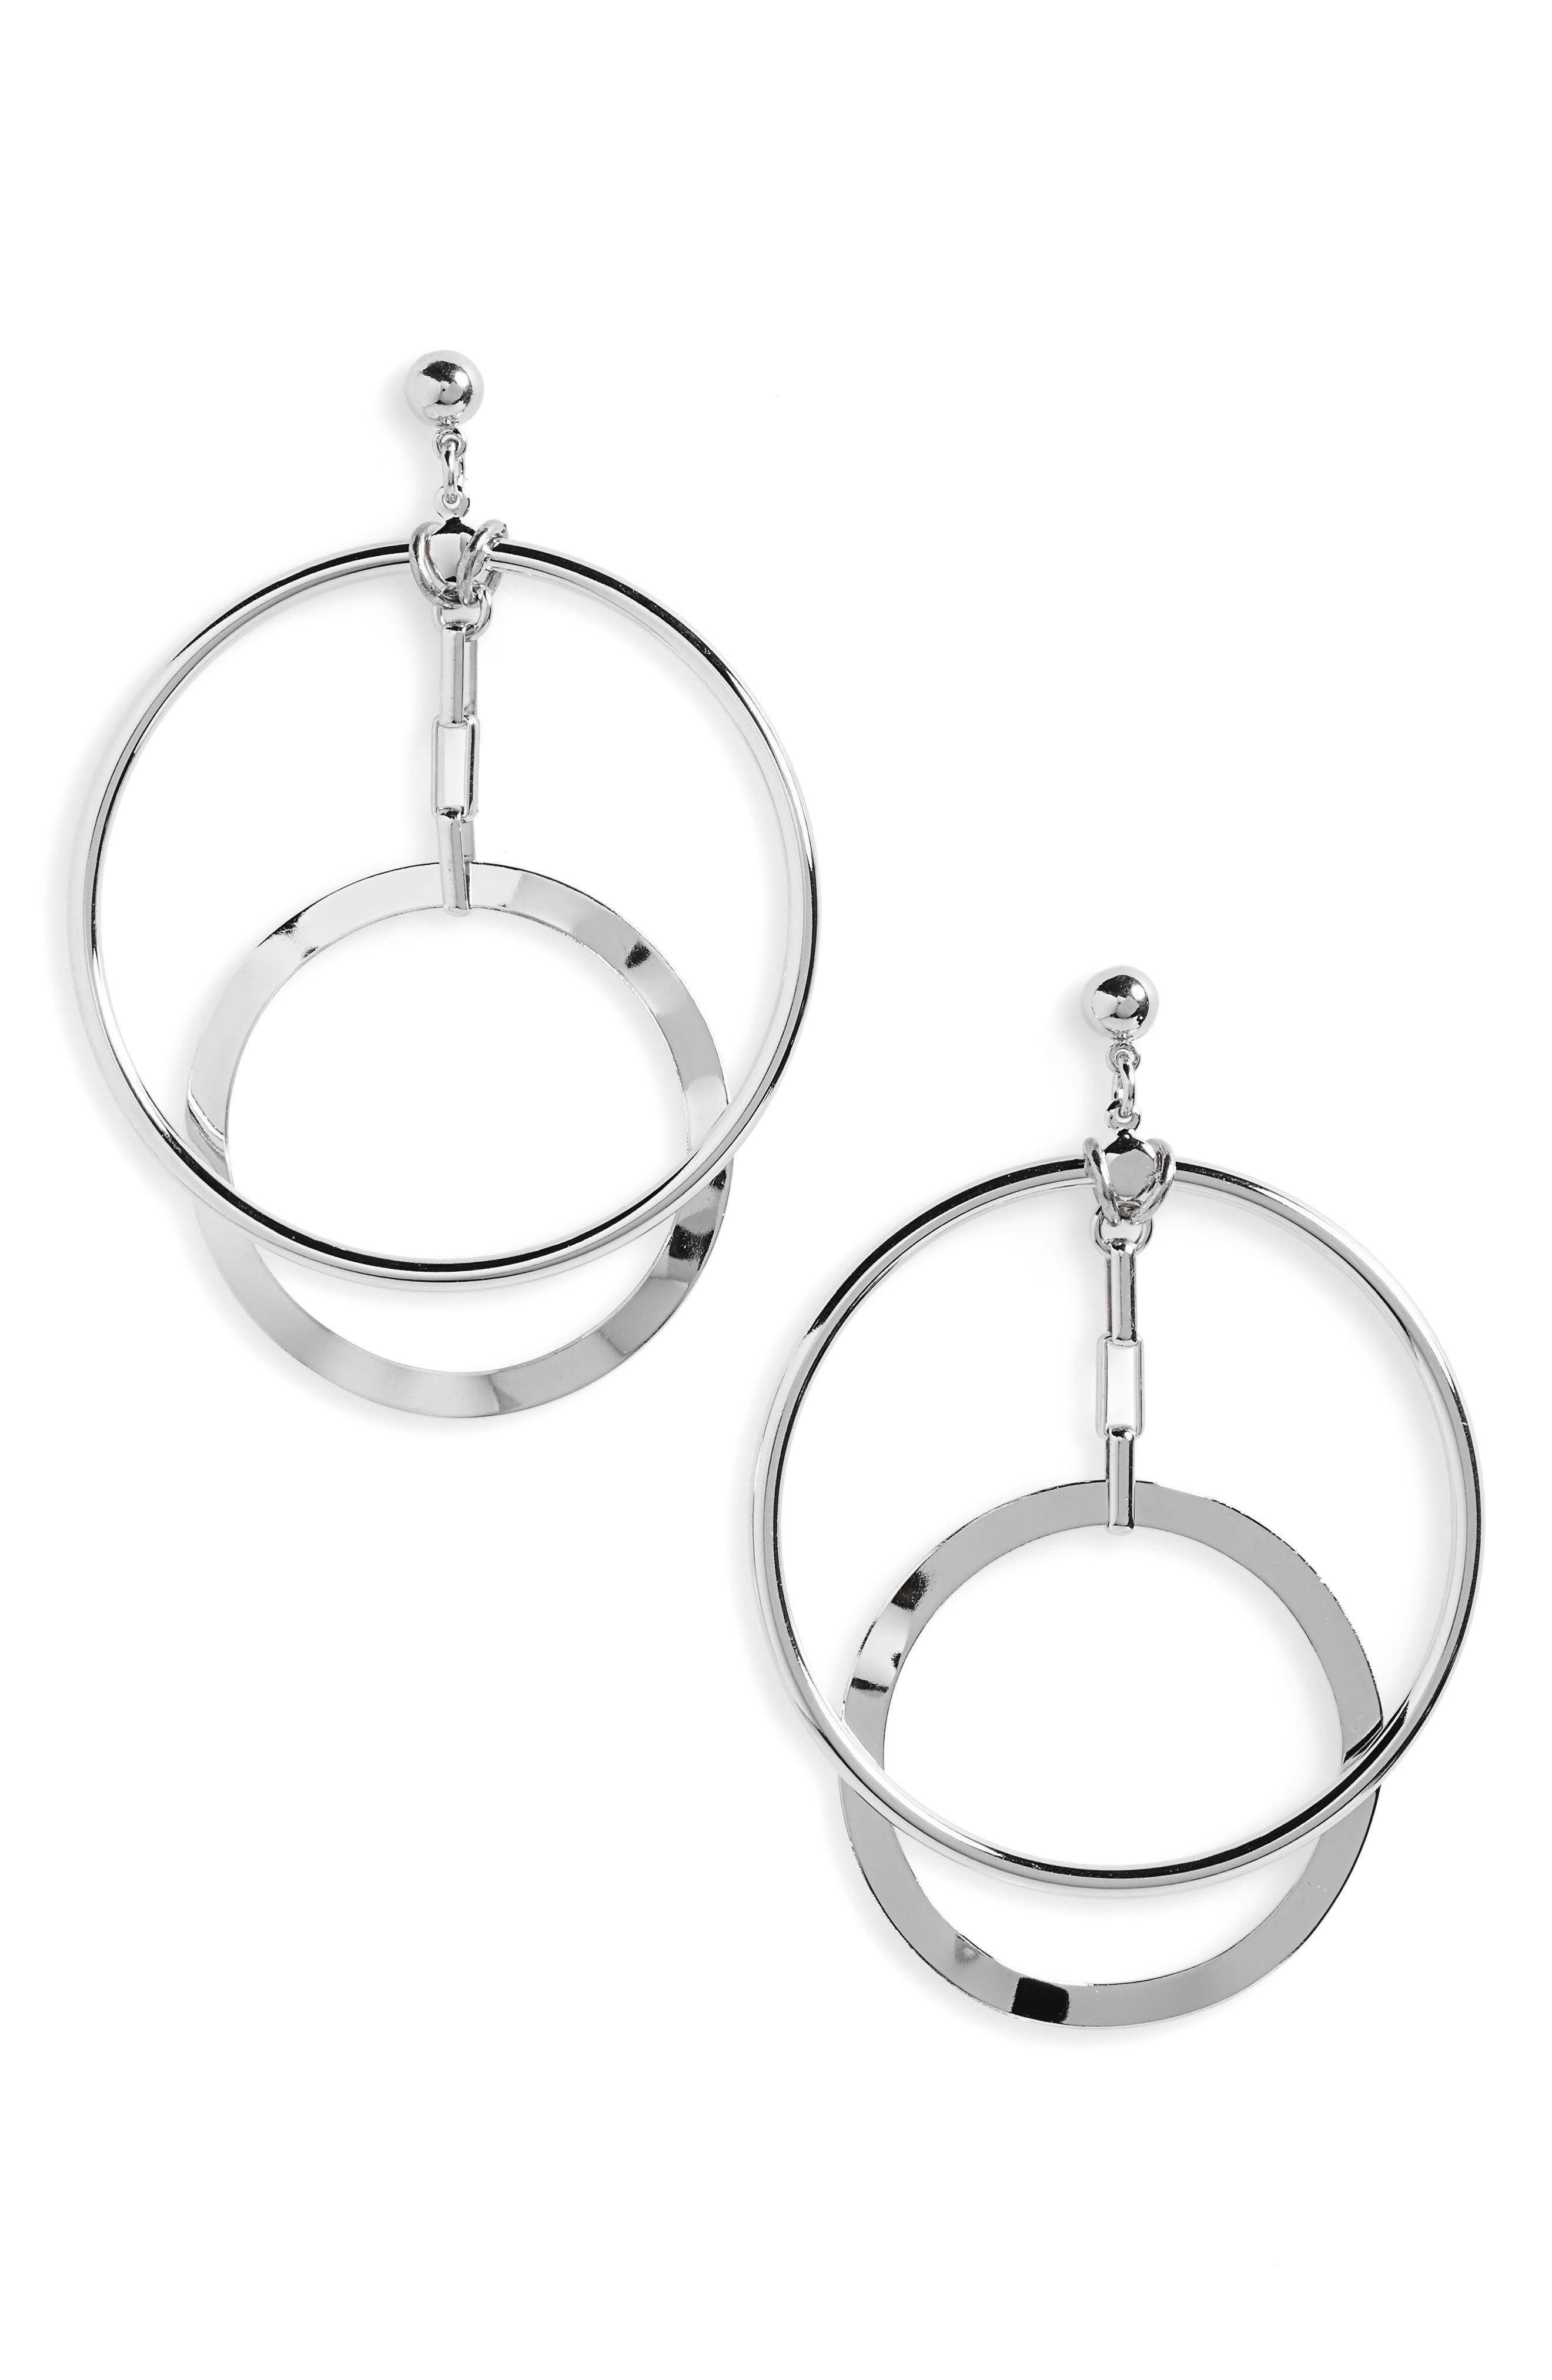 BIKO Eclipse Hoop Earrings